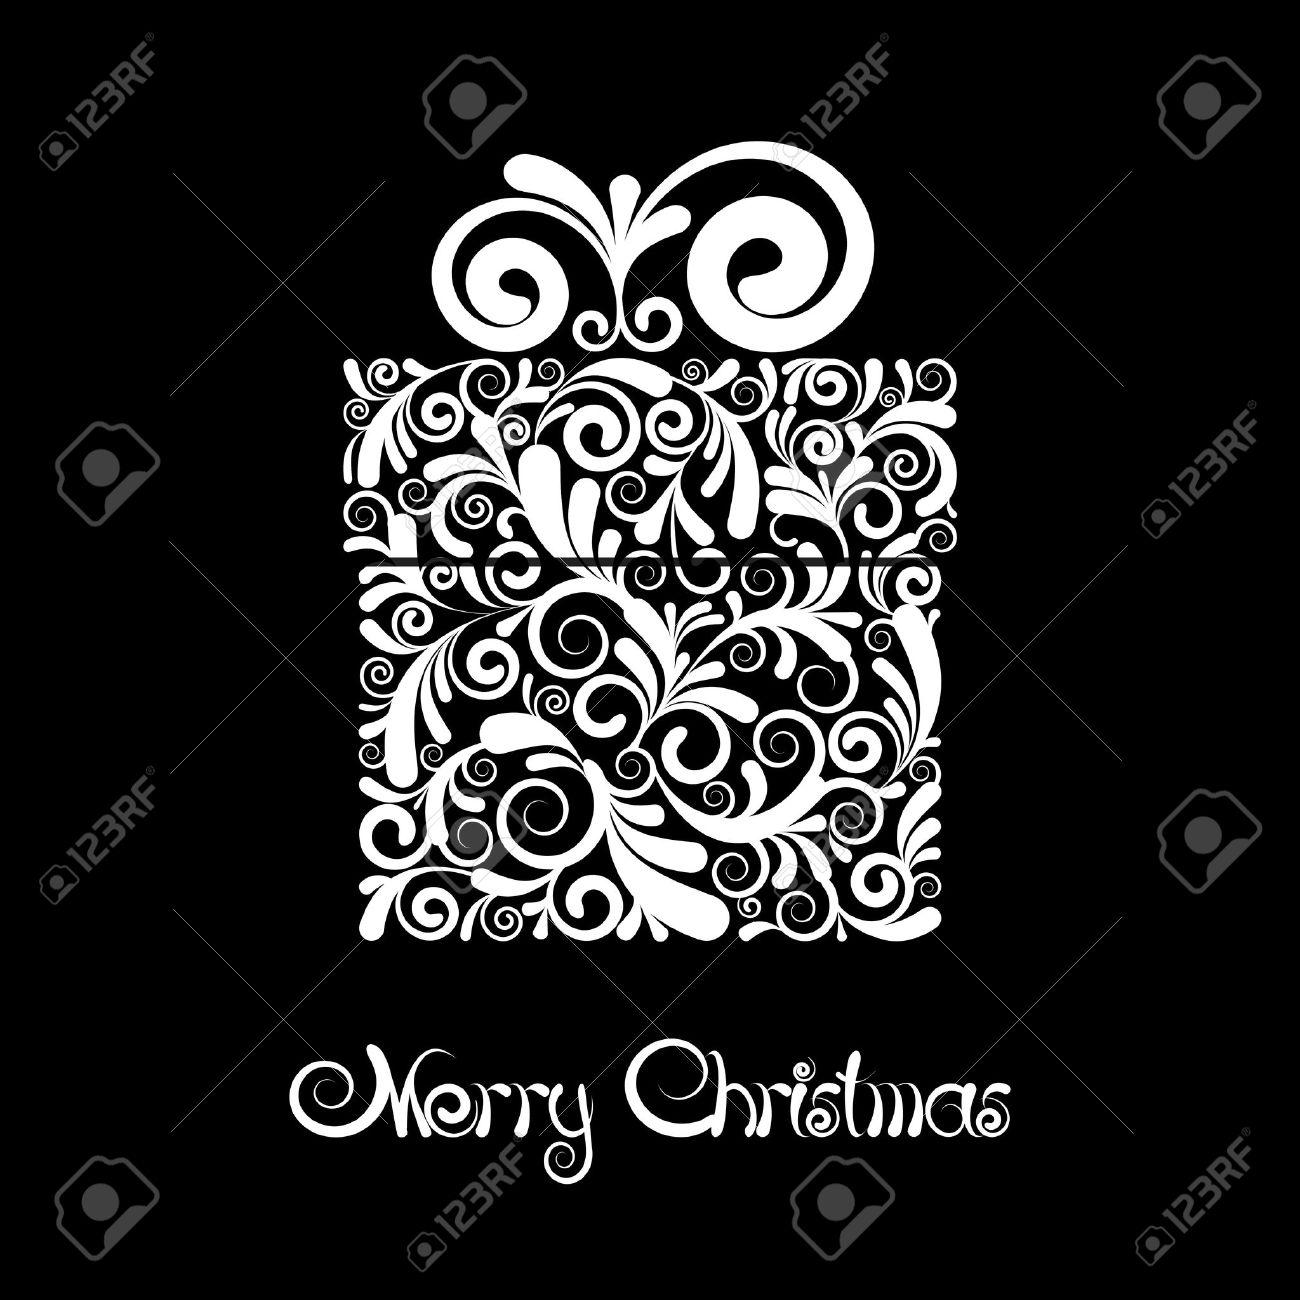 Christmas ornament black and white - Christmas Ornament Vector Christmas Card Gift Box With Scroll Ornament Black And White Vector